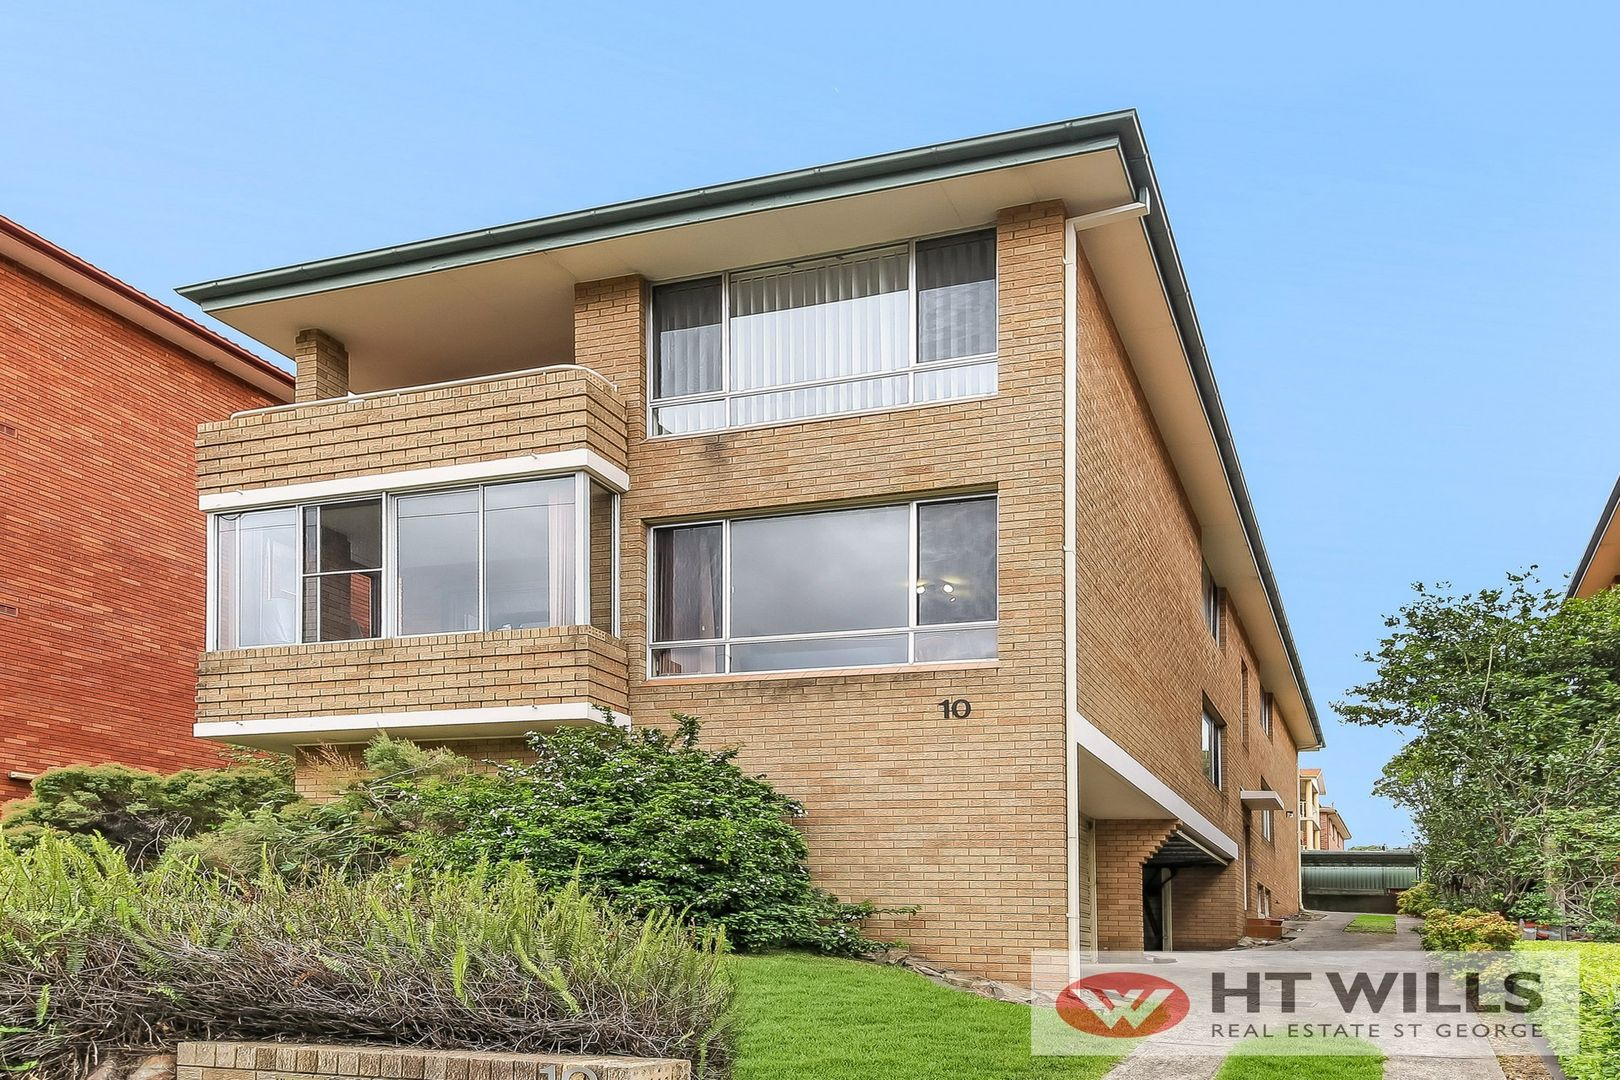 1/10 Woids Avenue, Hurstville NSW 2220, Image 0